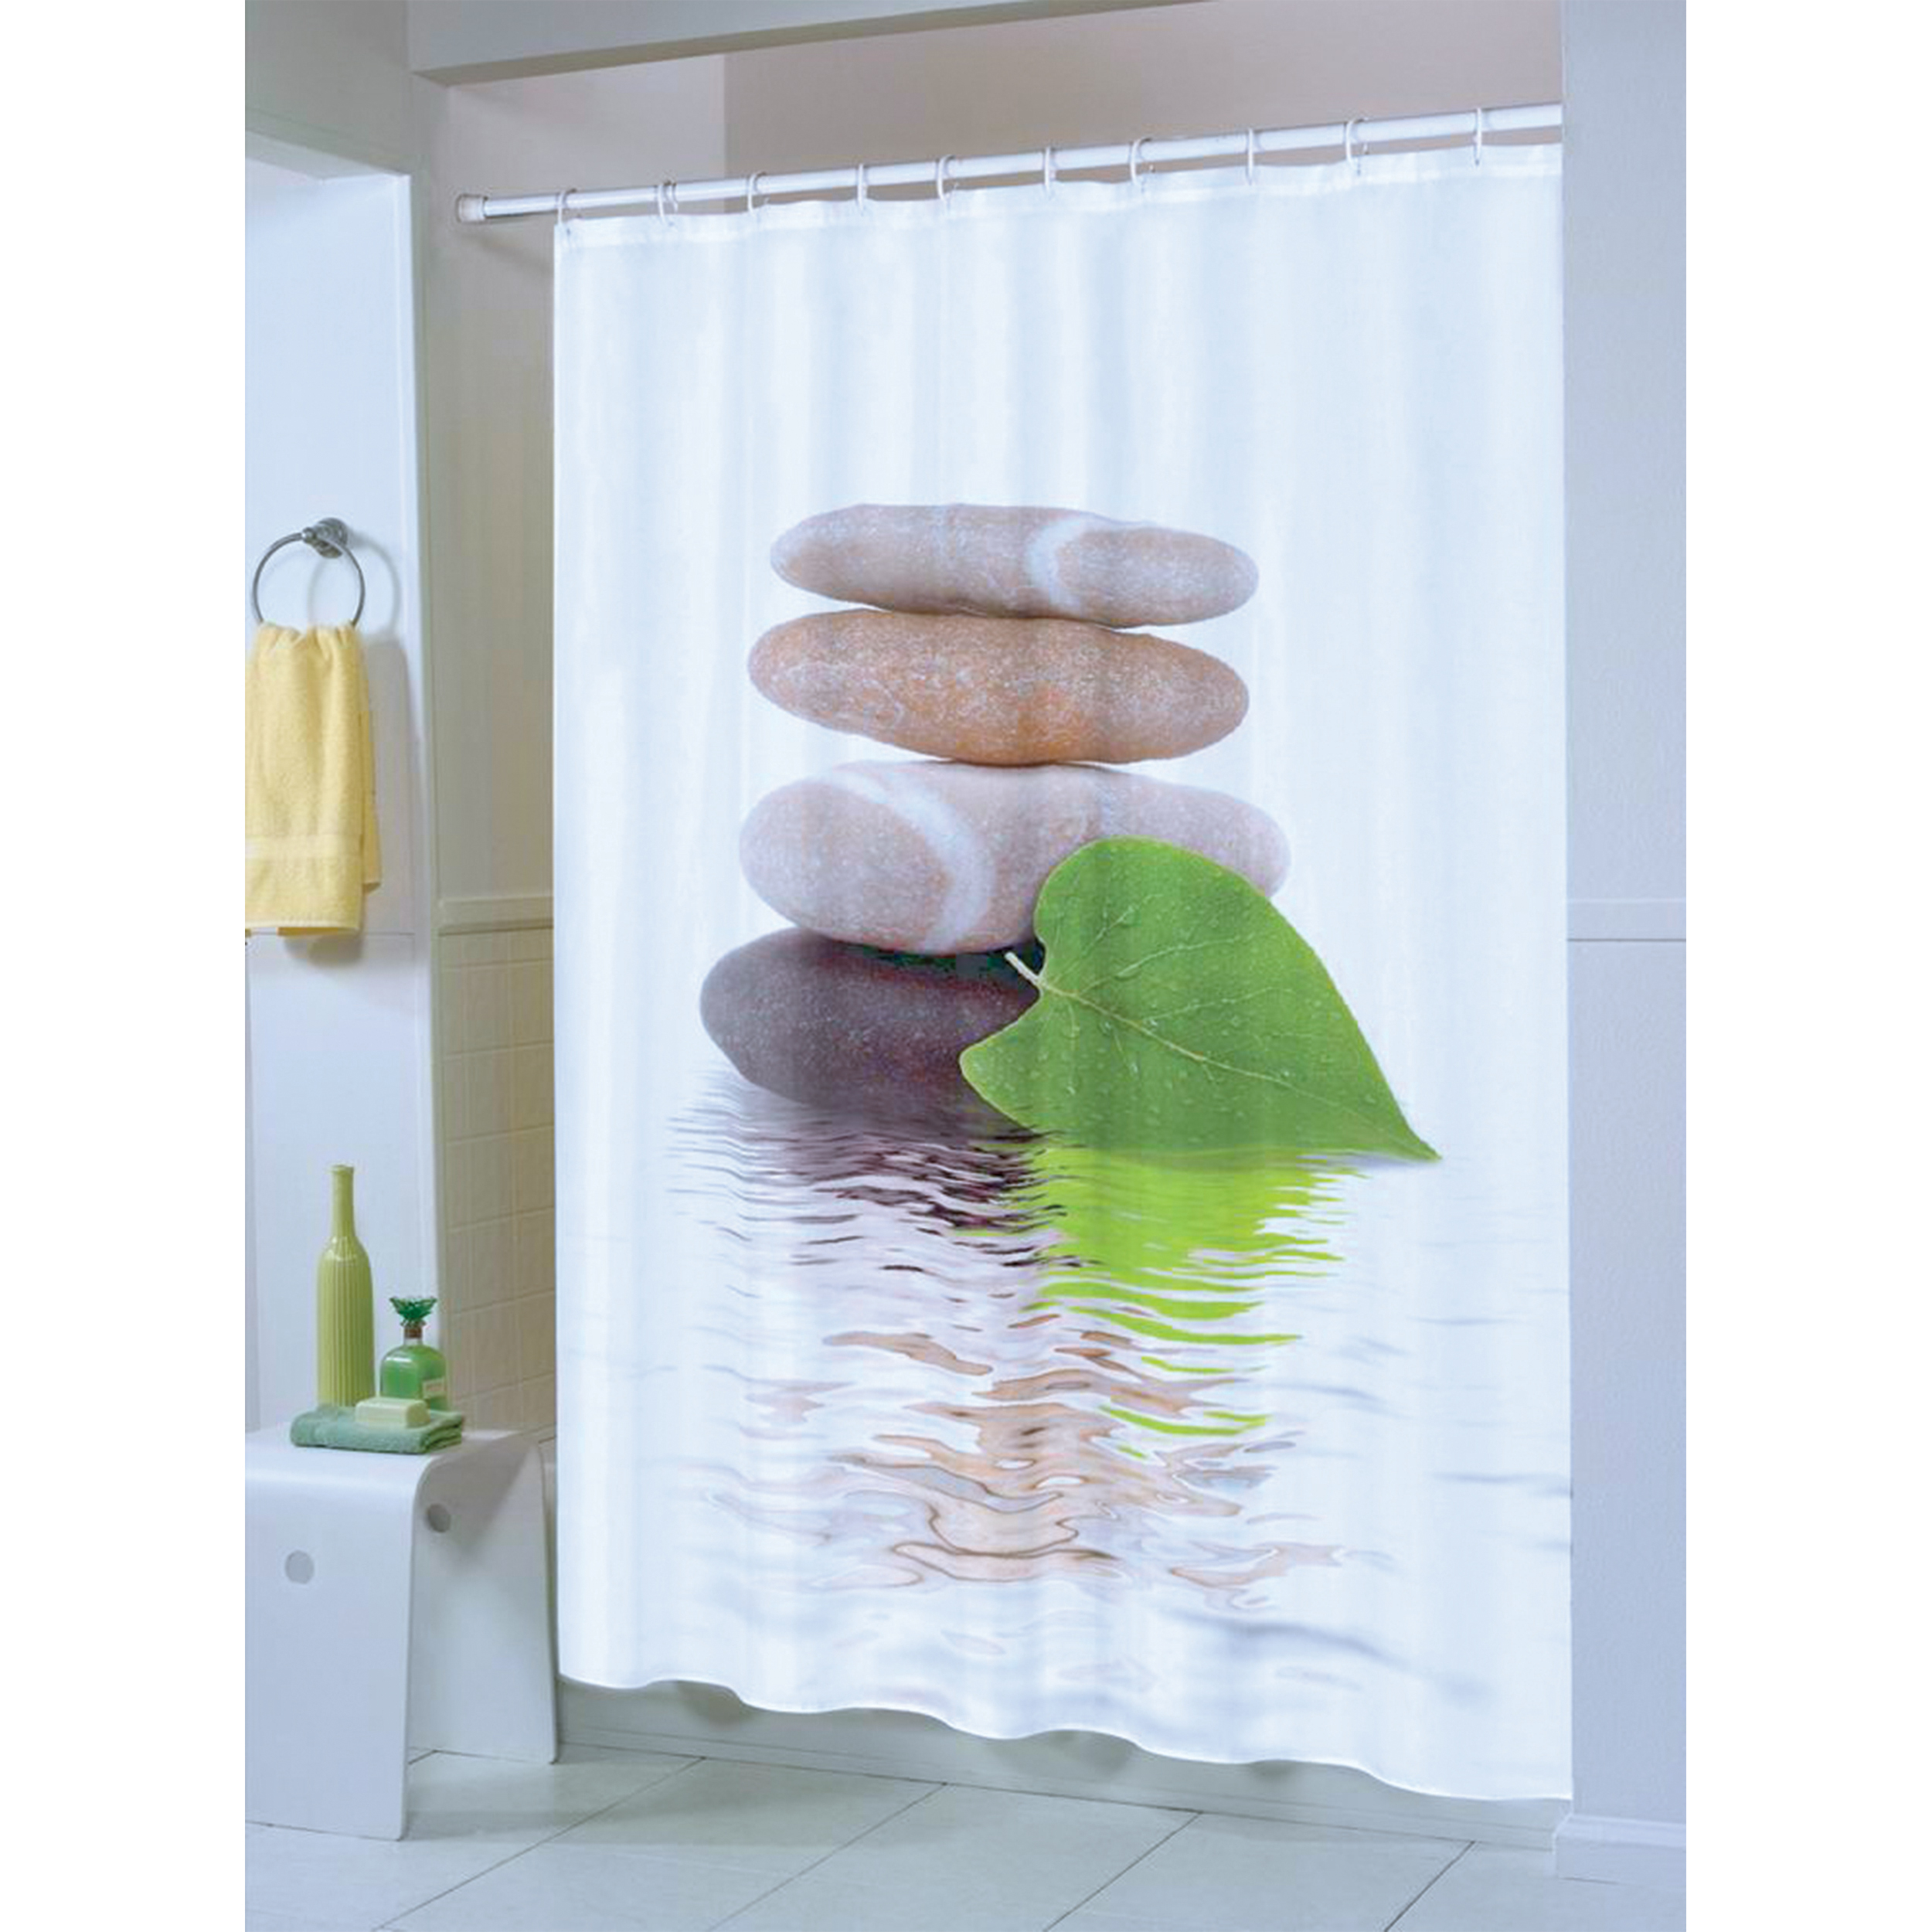 MSV Duschvorhang 180x200cm Anti Schimmel Textil Badewannenvorhang Wannenvorhang Lingga